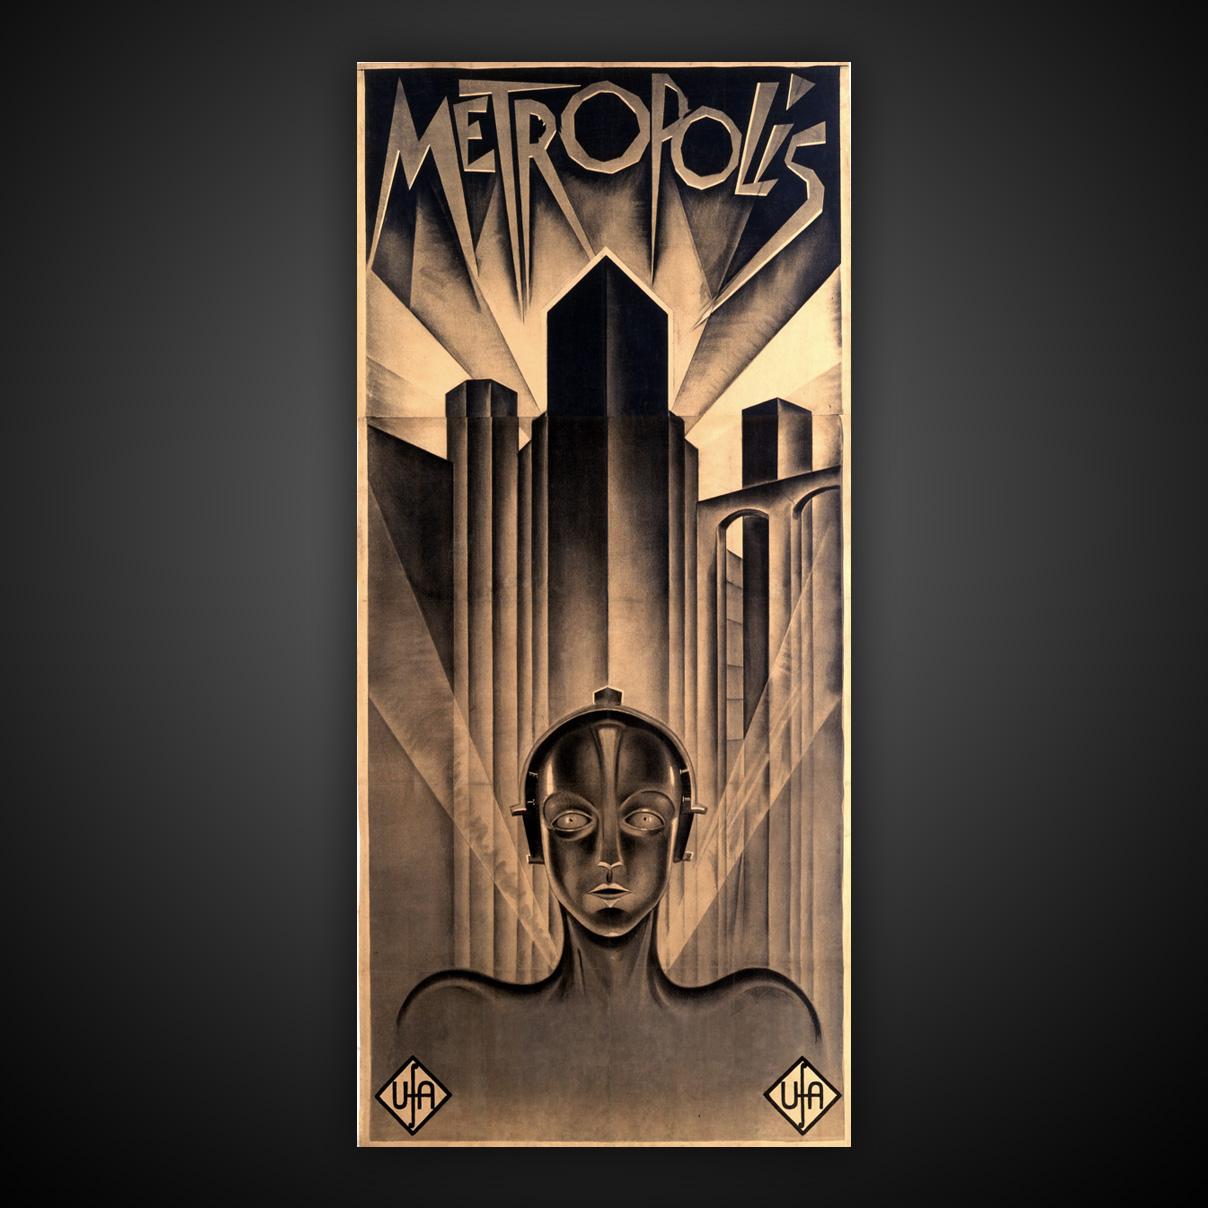 metropolis-poster.jpg